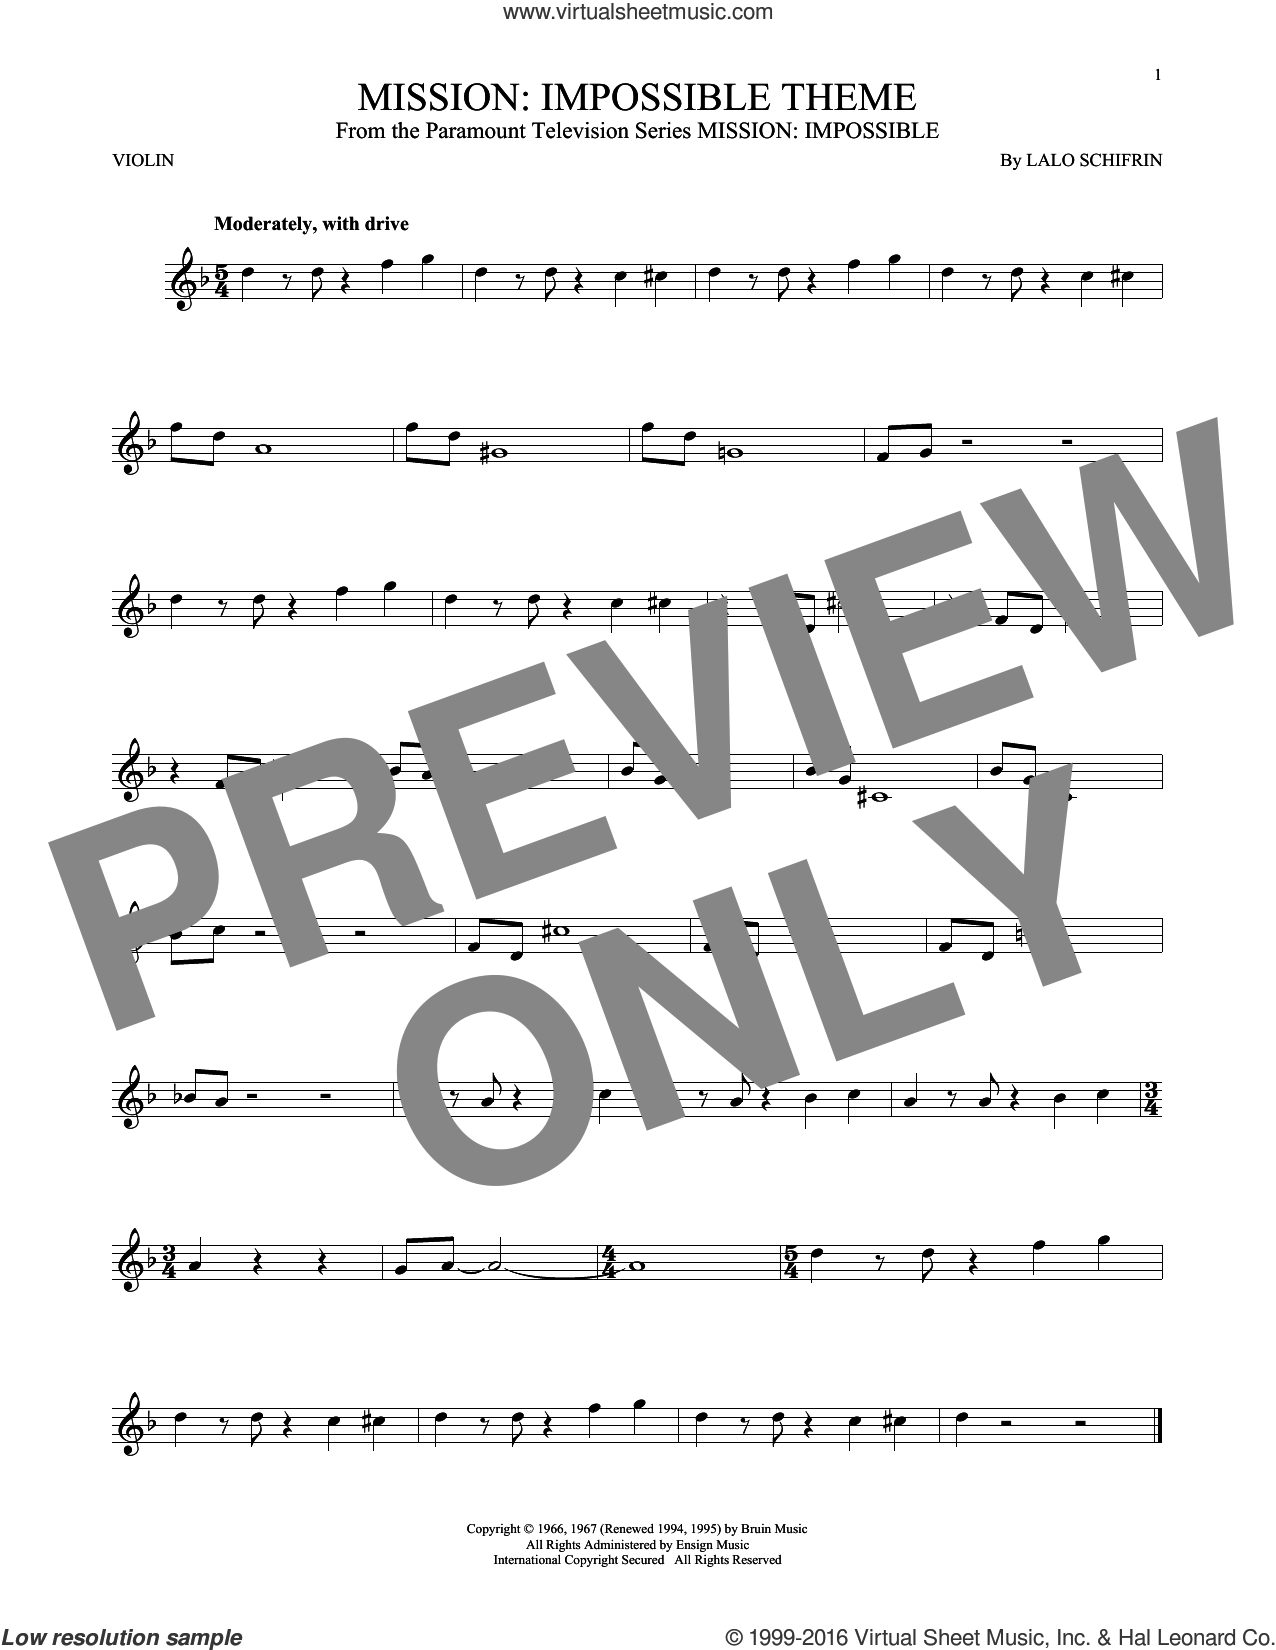 Mission: Impossible Theme sheet music for violin solo by Lalo Schifrin, intermediate skill level